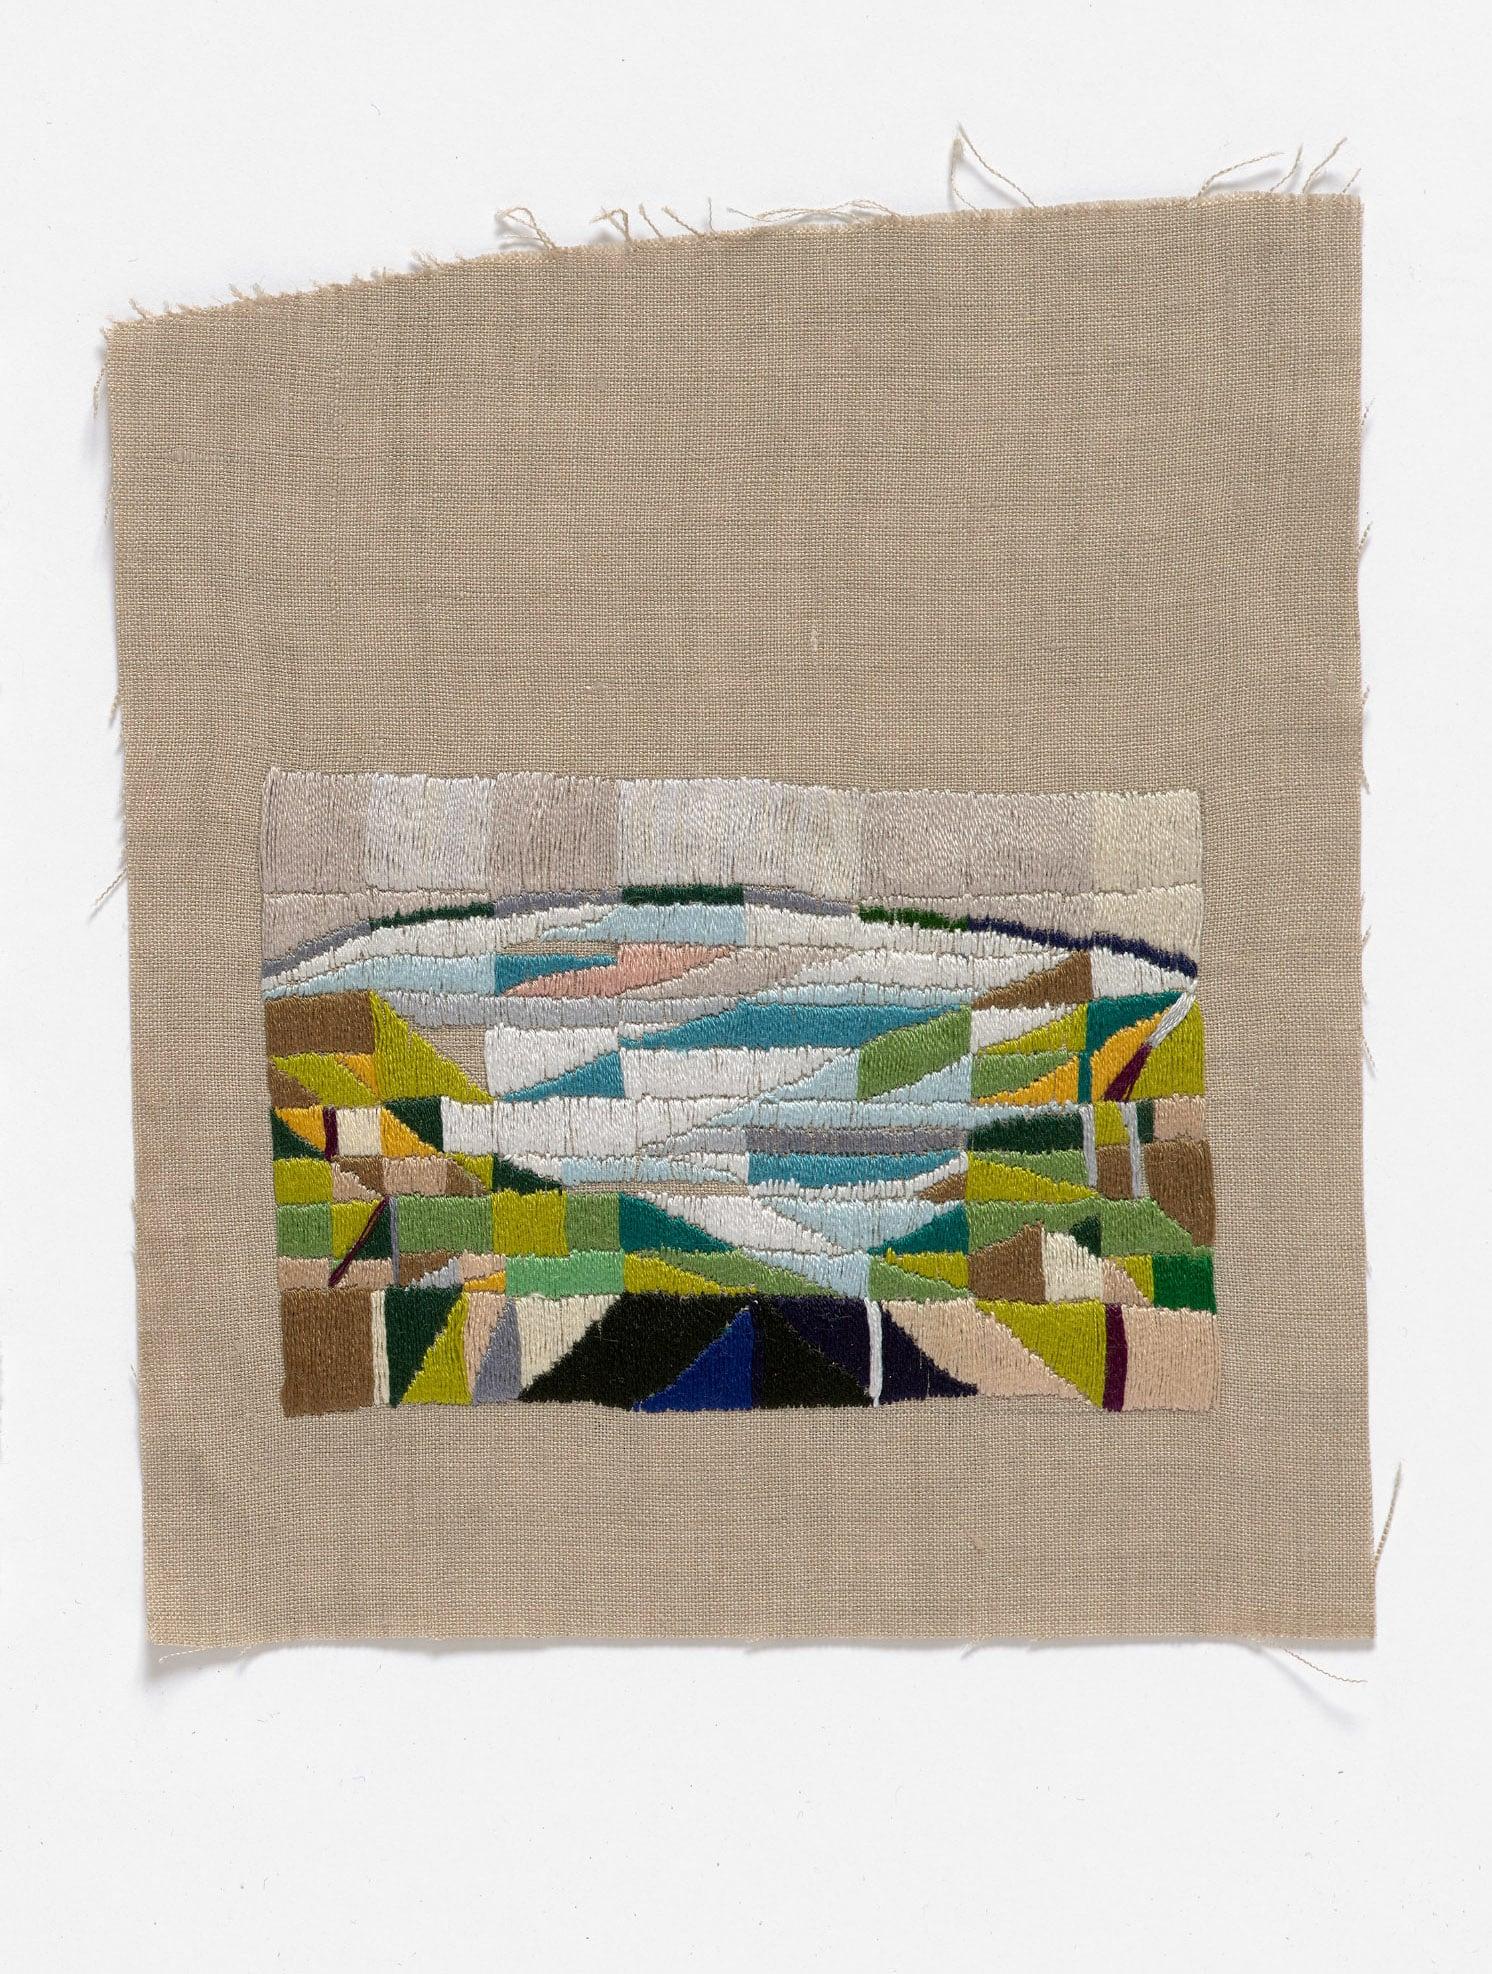 Roadtrip to Melinda's show  2015 Cotton thread on linen 17 x 20cm